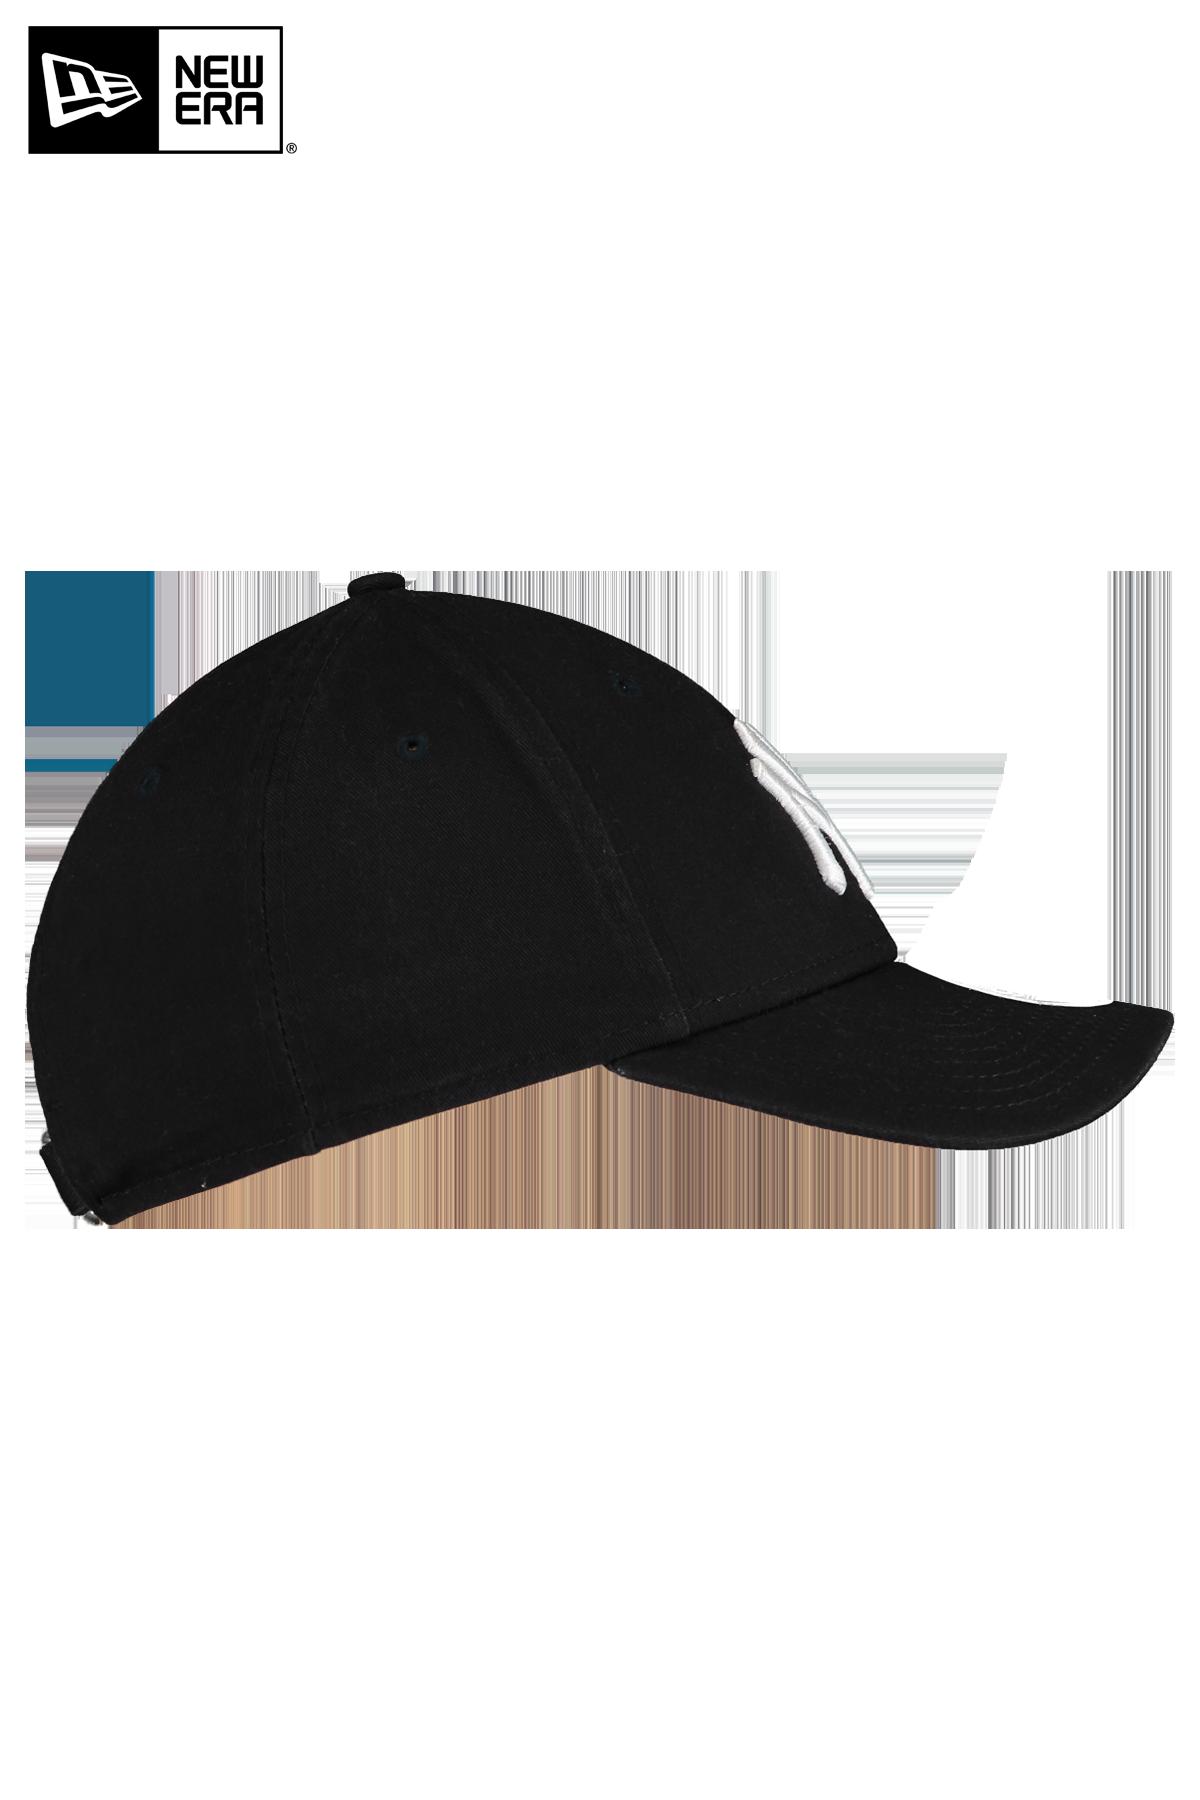 Cap 940 adjustable-nyy-mlb